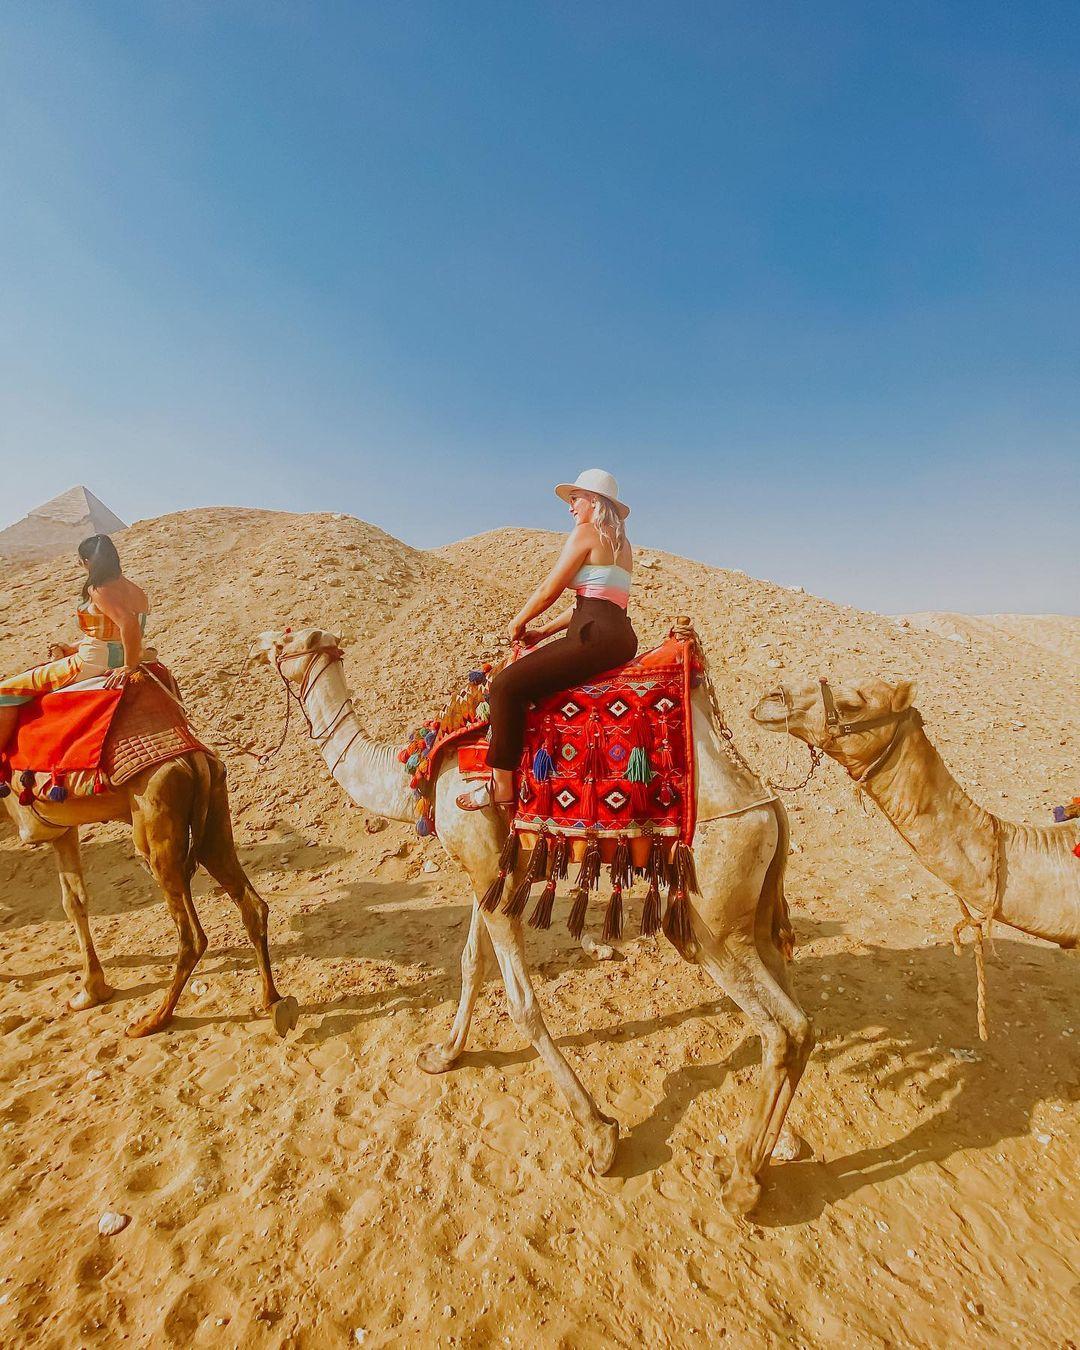 Despre Hurghada (Egipt), cand sa mergi, perioade bune si atractii turistice